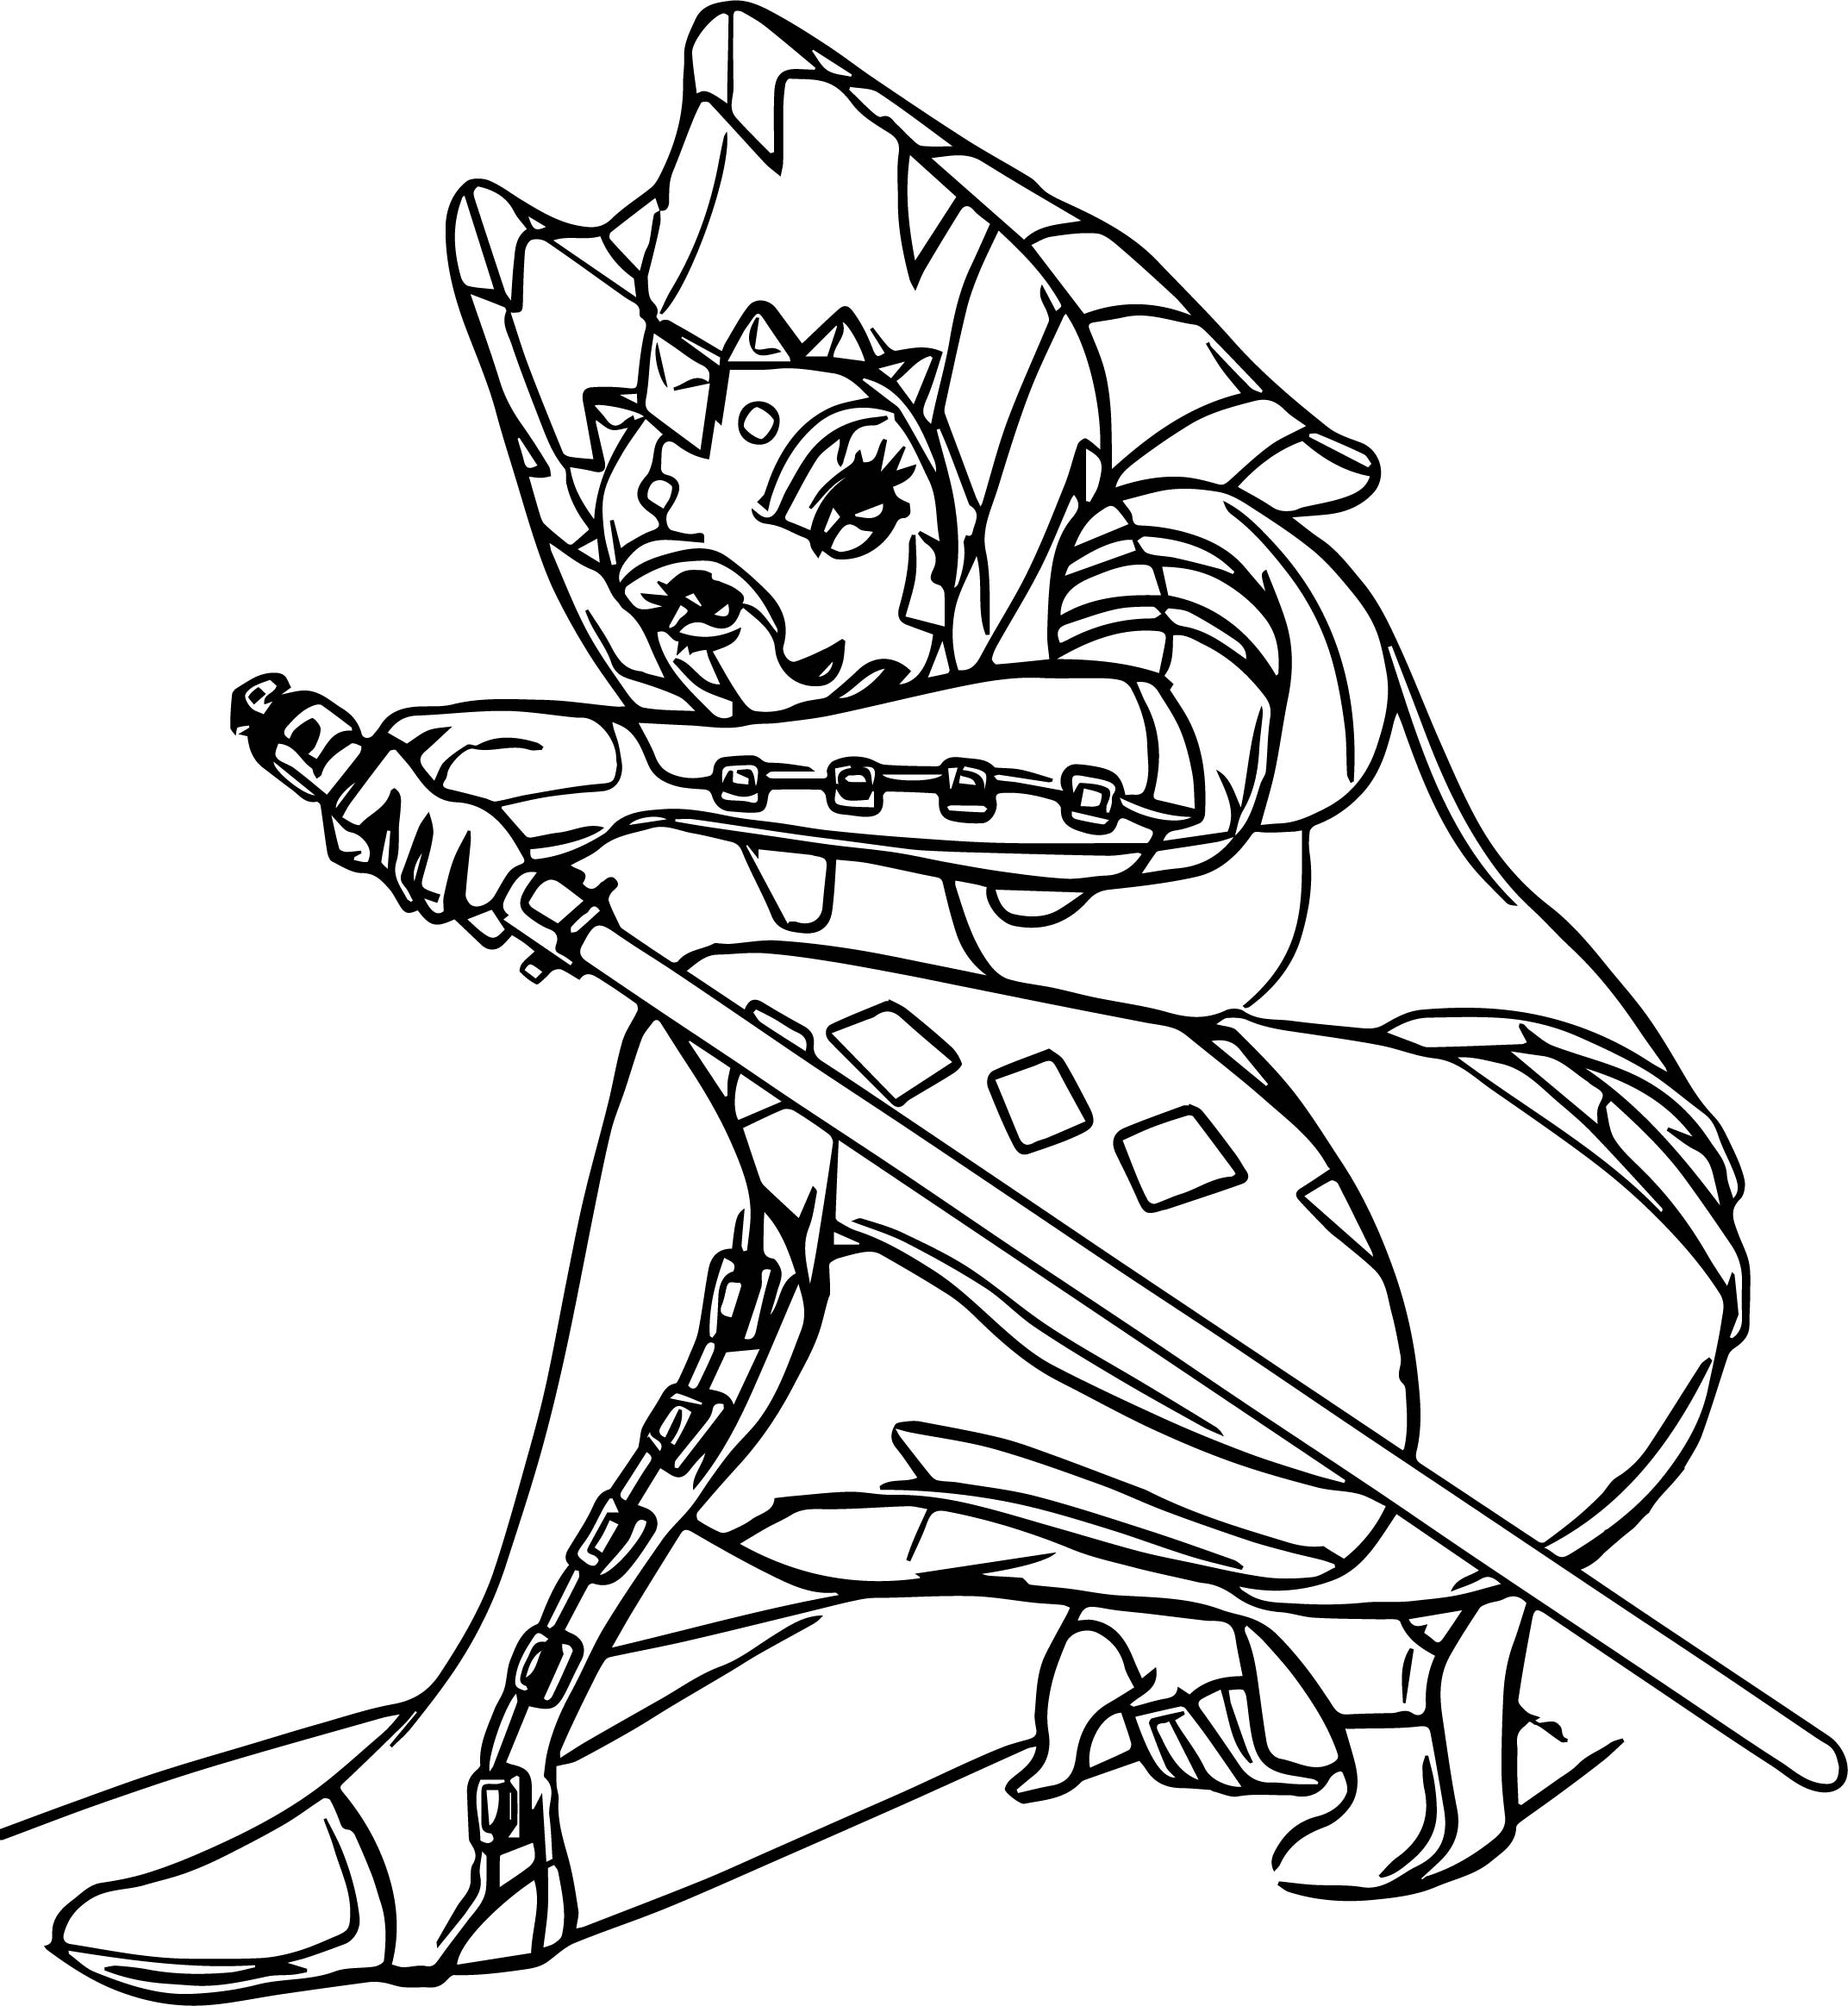 Ahsoka Tano Guard Coloring Page Wecoloringpage Ahsoka Tano Coloring Pages